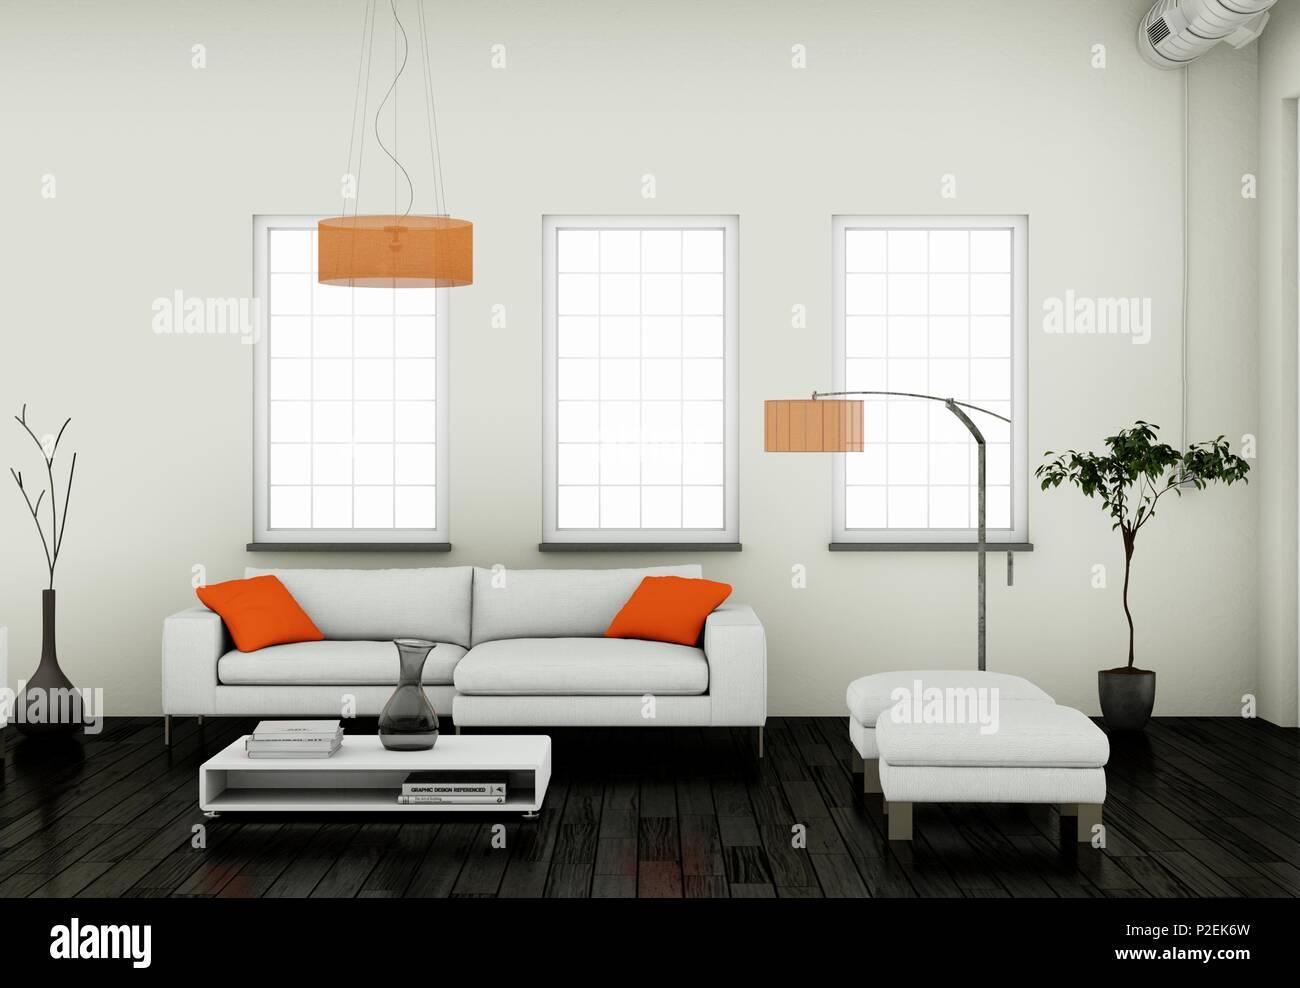 Modern bright living room Color Modern Bright Living Room Interior Design With Sofas Alamy Modern Bright Living Room Interior Design With Sofas Stock Photo